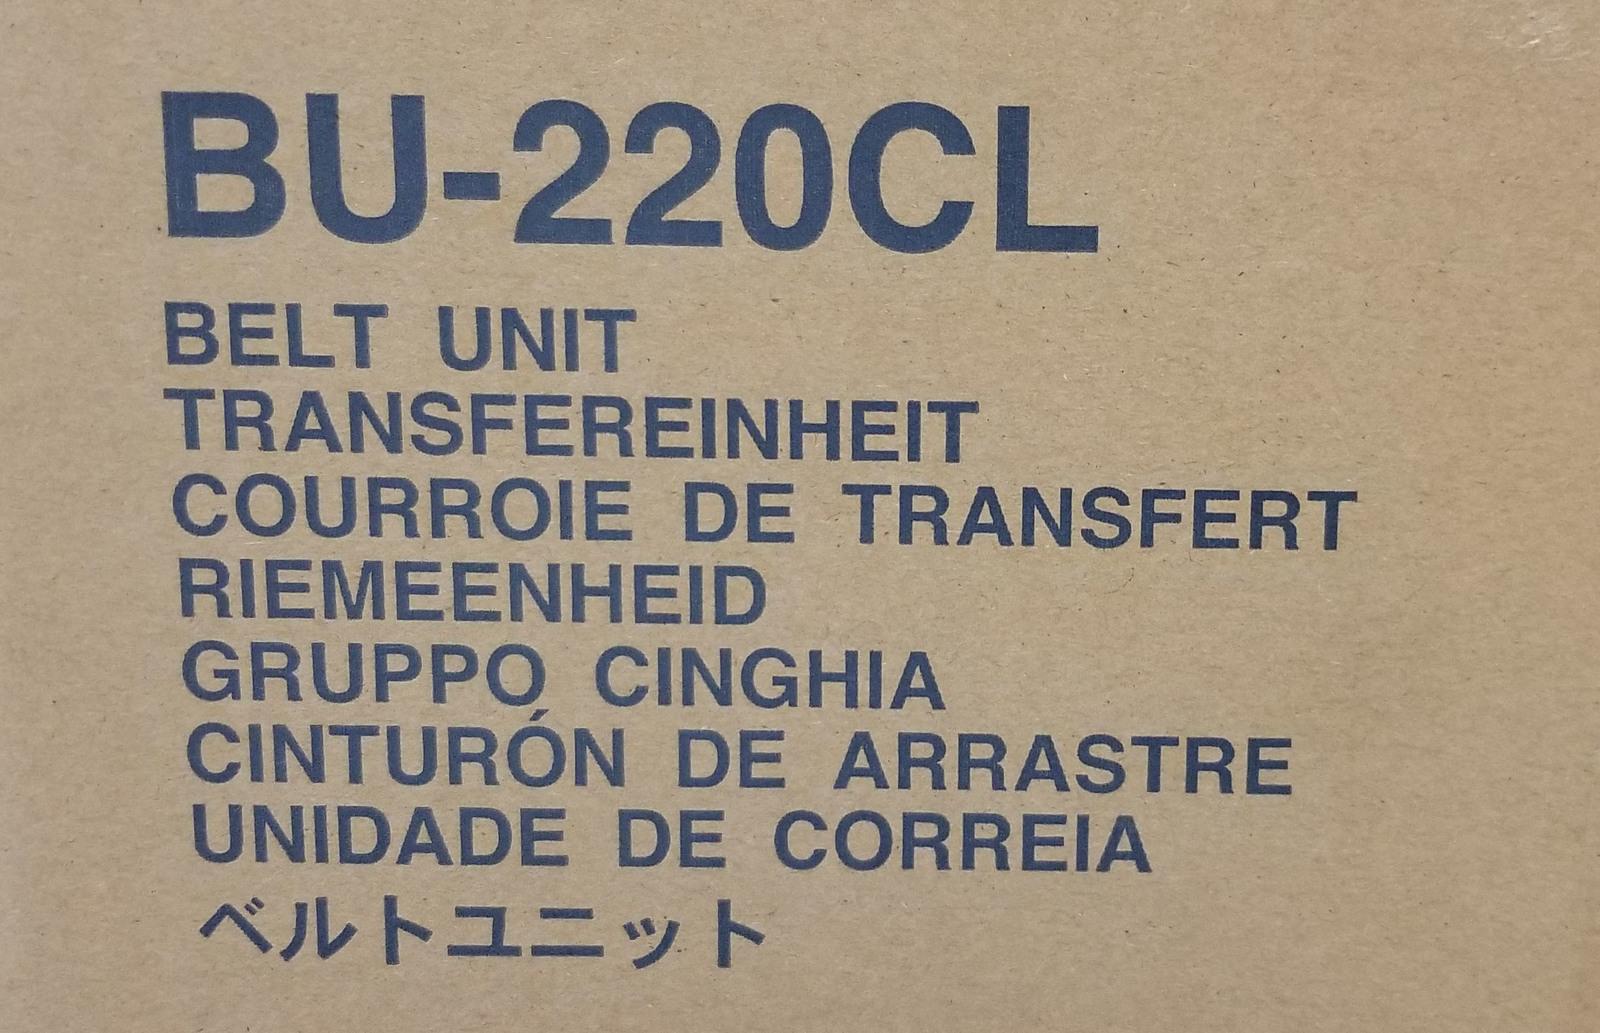 Brother BU-220CL Wireless Color Laser Printer Belt Unit Bin:10